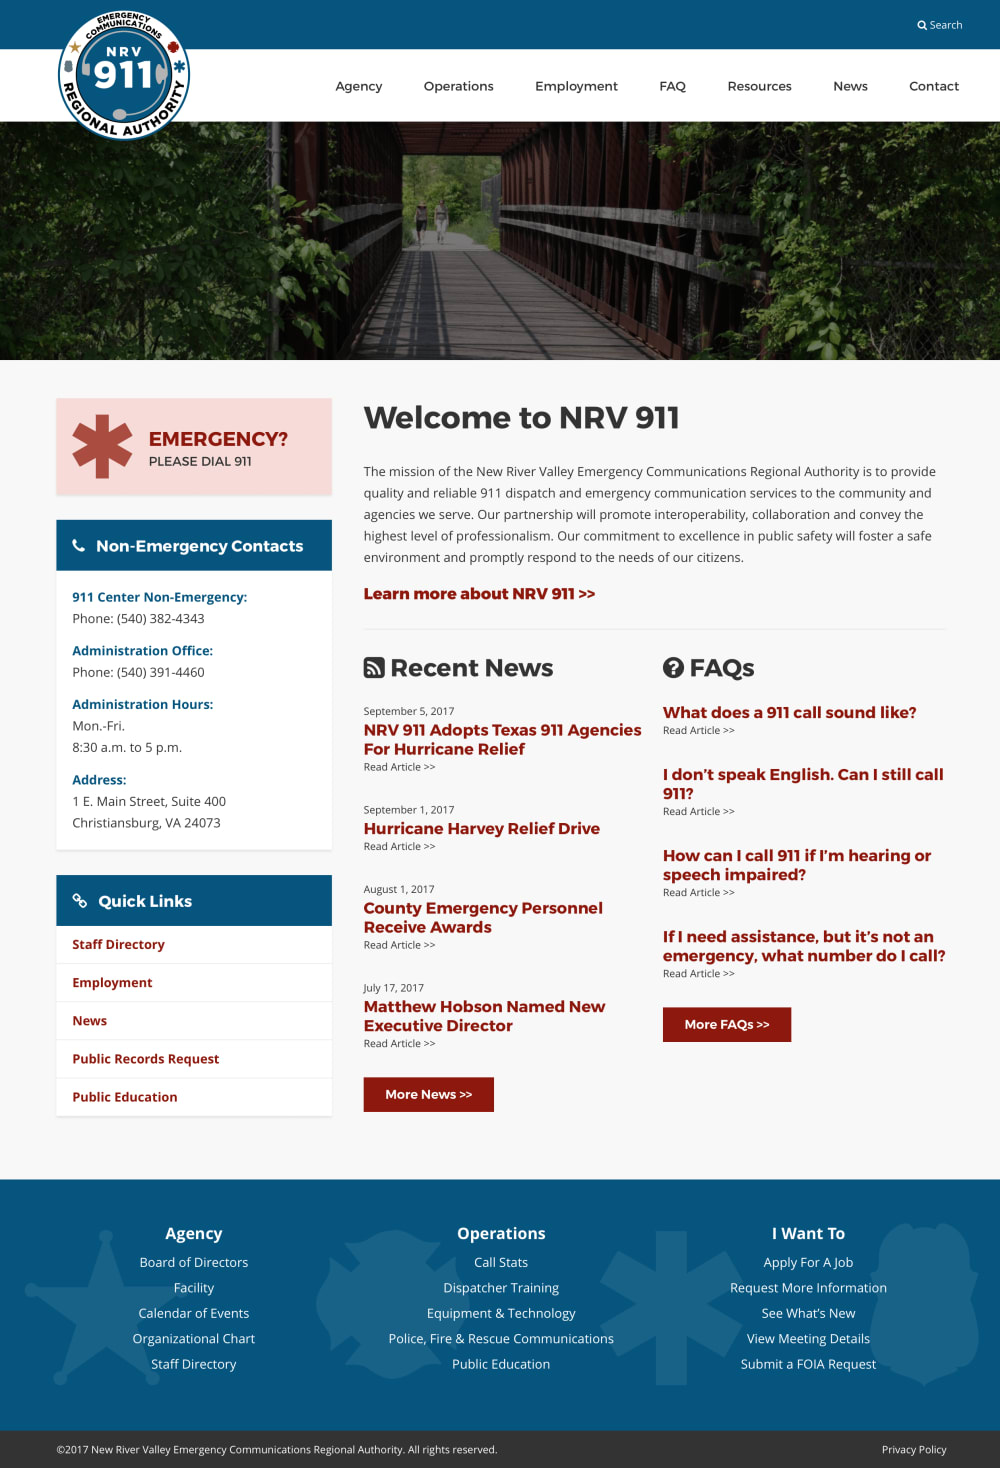 NRV 911 Homepage